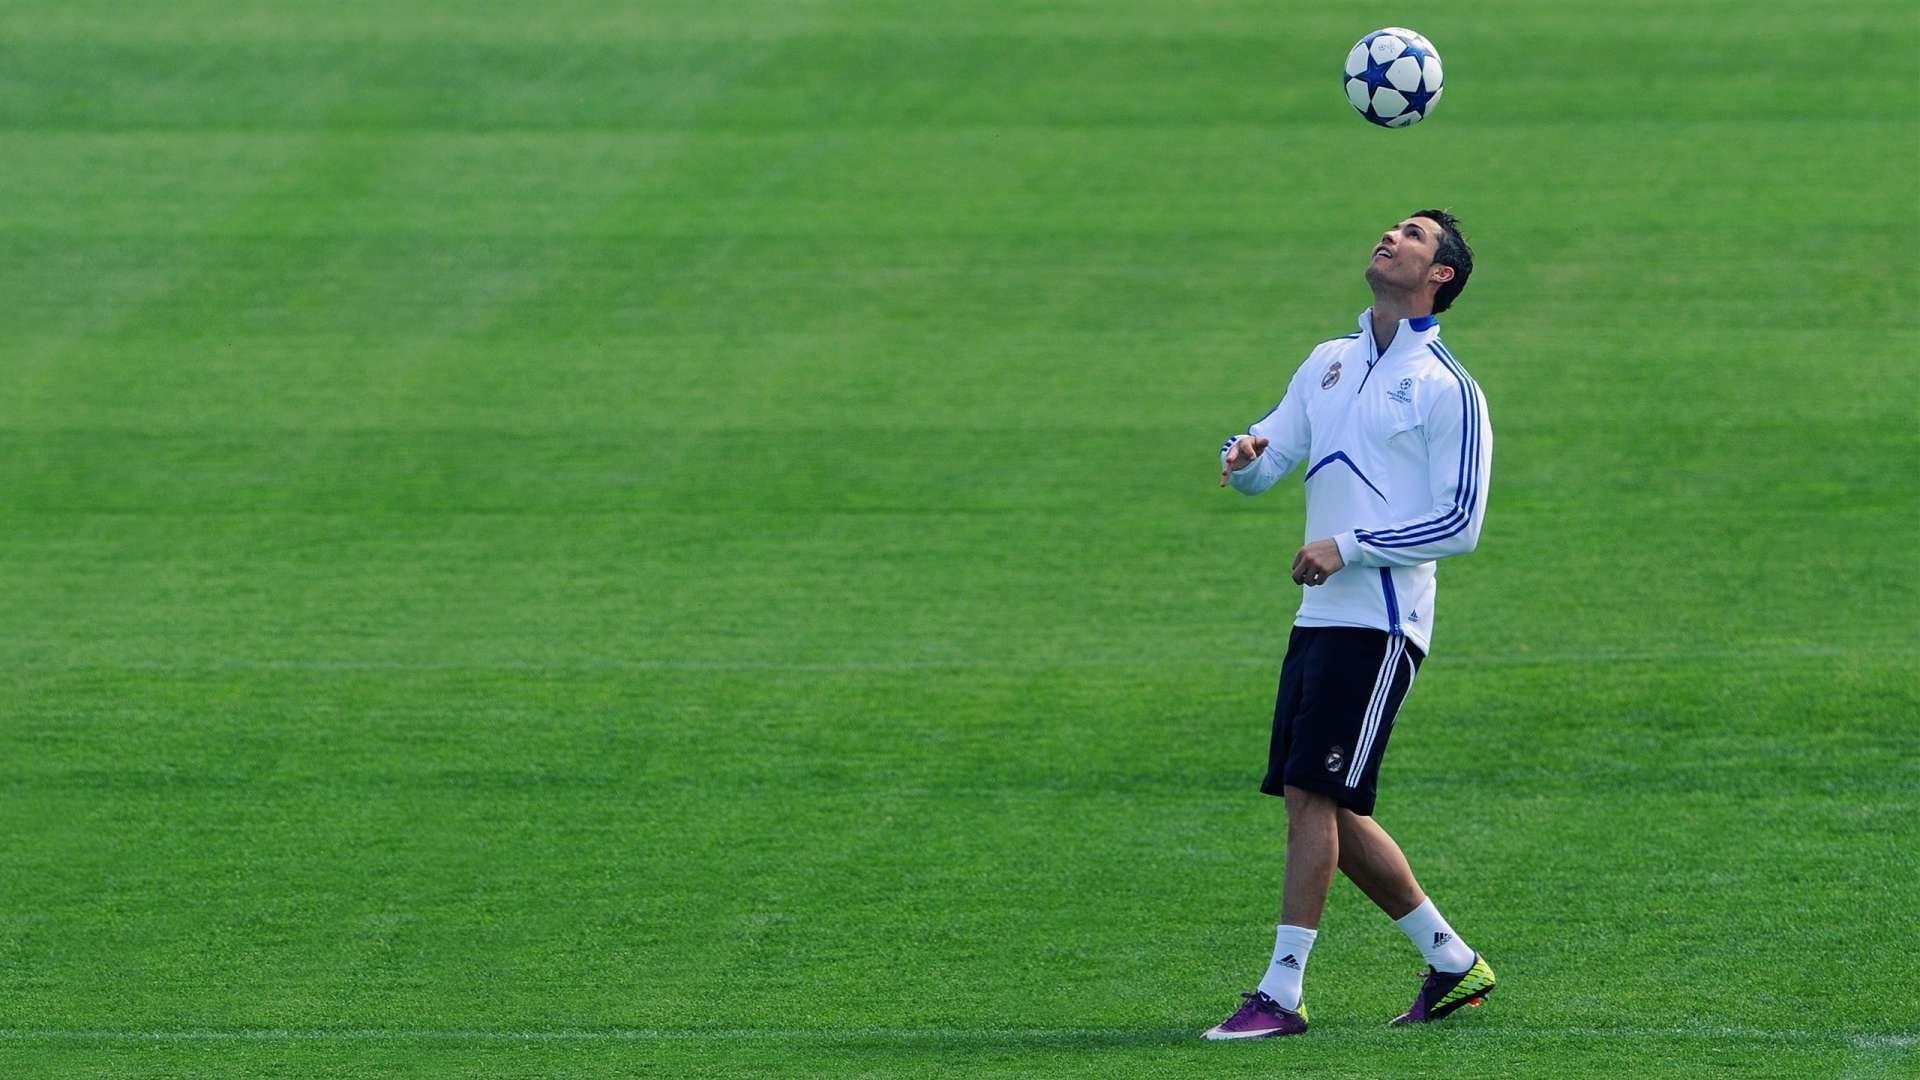 Cristiano Ronaldo HD Images | Stunning Pics of Cristiano Ronaldo